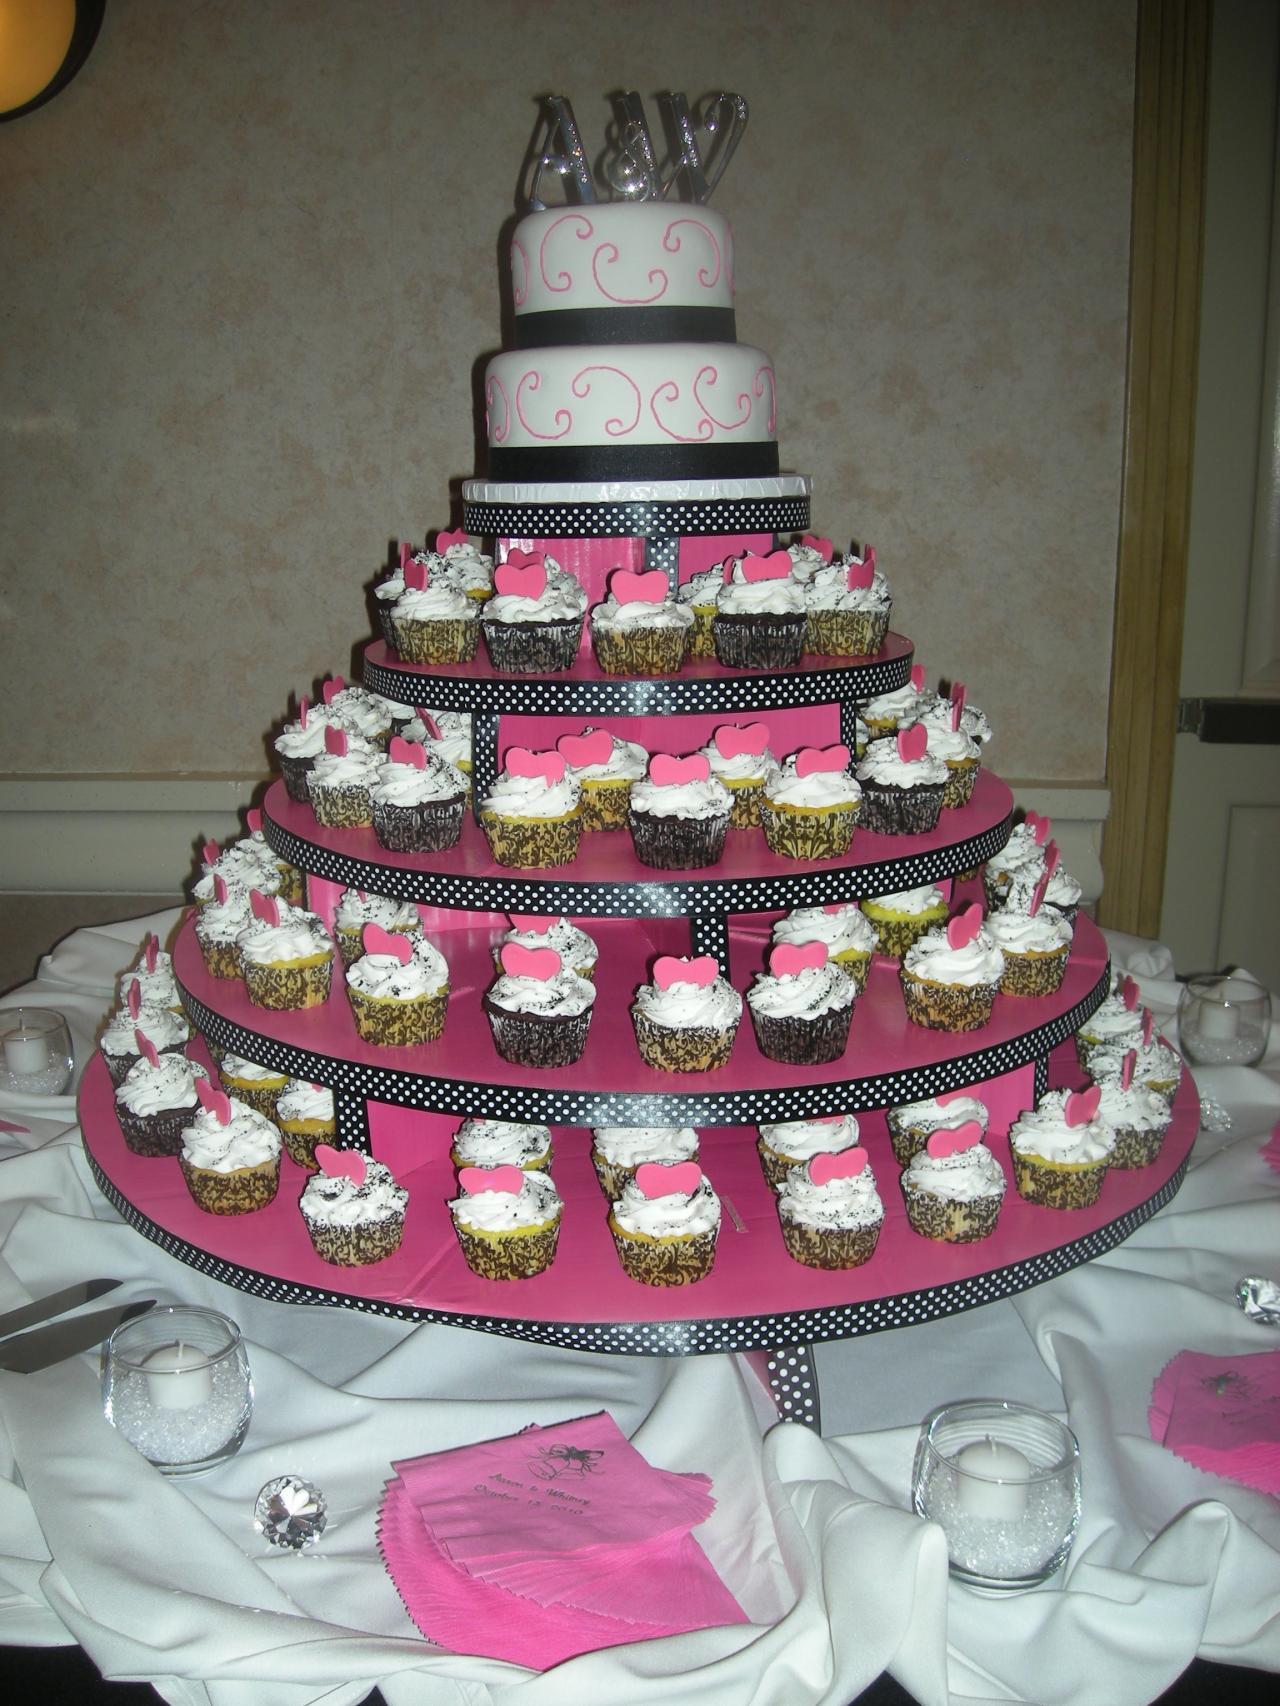 Wedding Cakes Galleries  My Goodness Cakes Wedding Cake Gallery 1